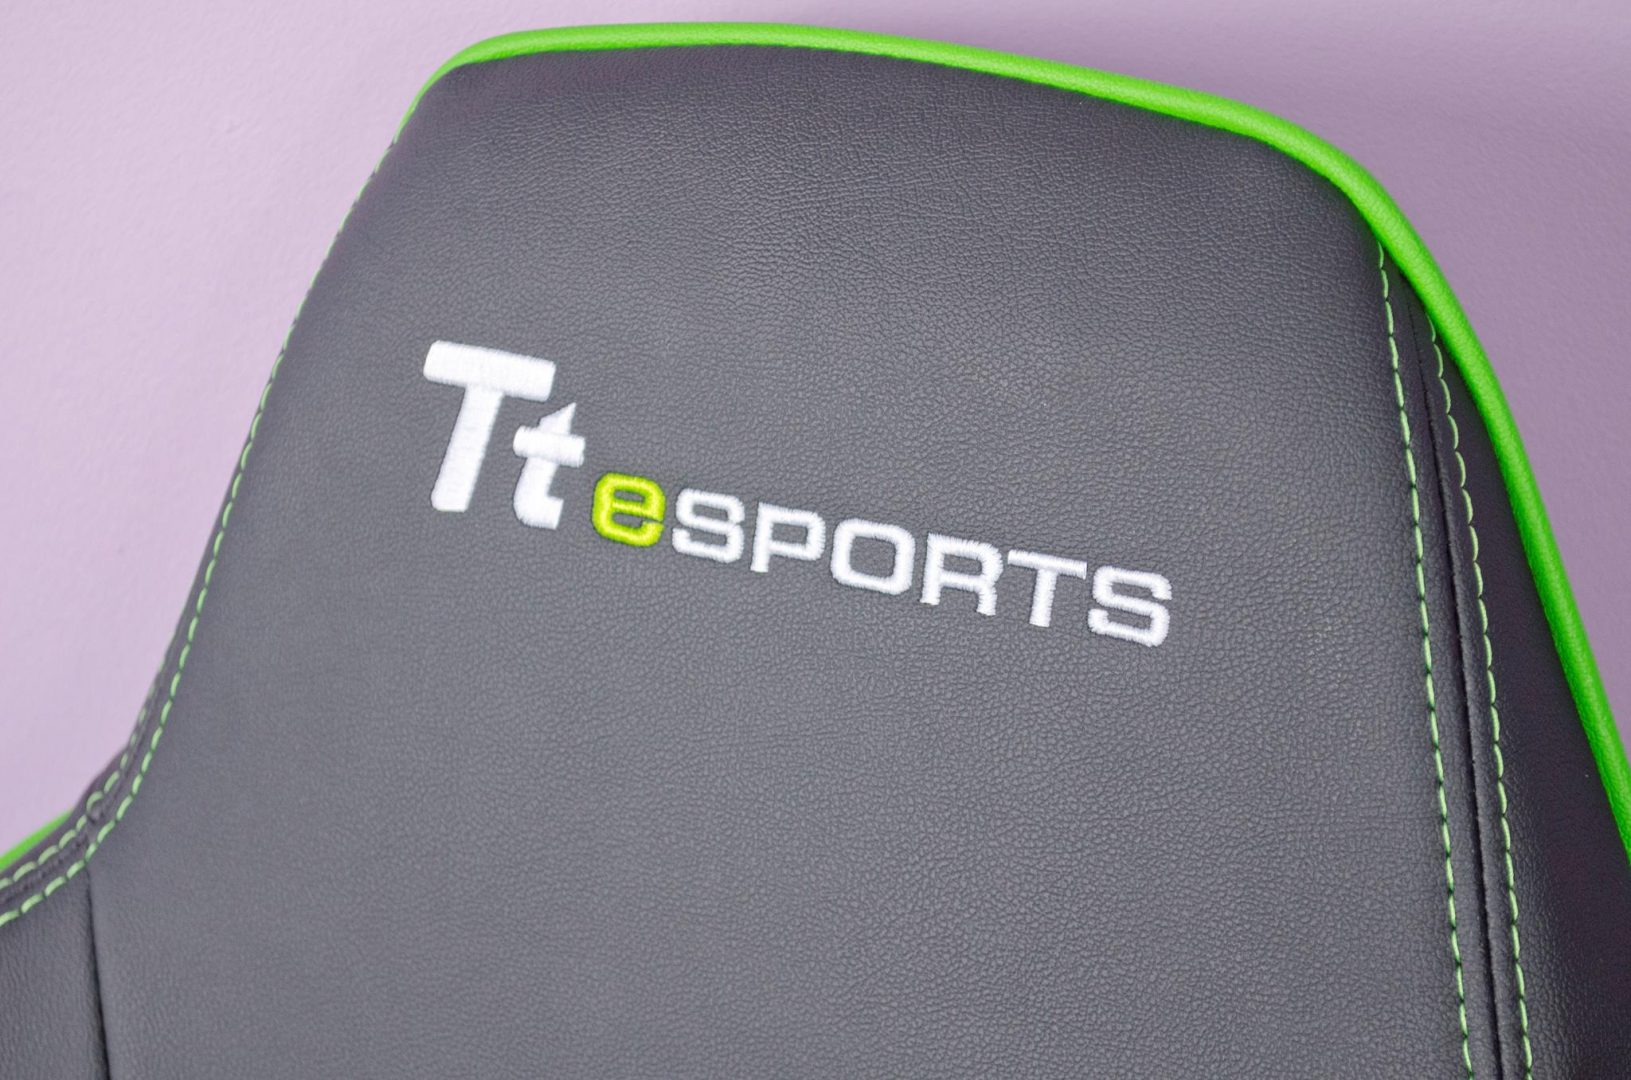 tt esports gt comfort gaming chair_21